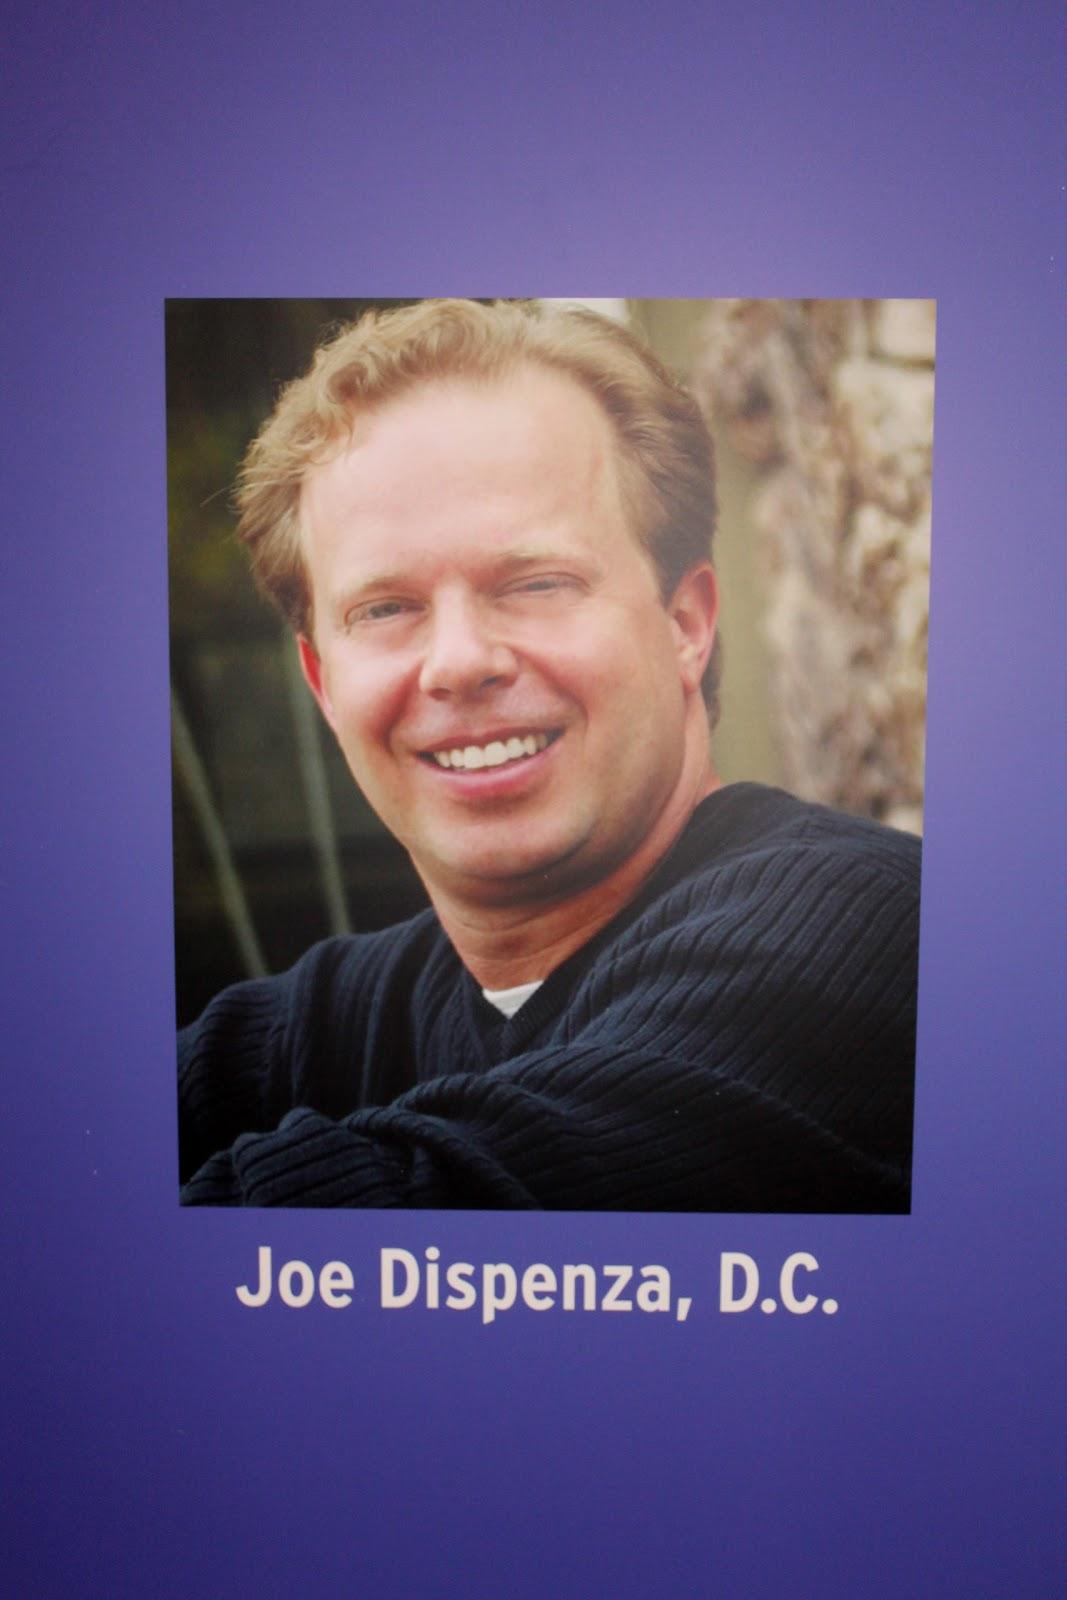 Joe dispenza guided meditation download